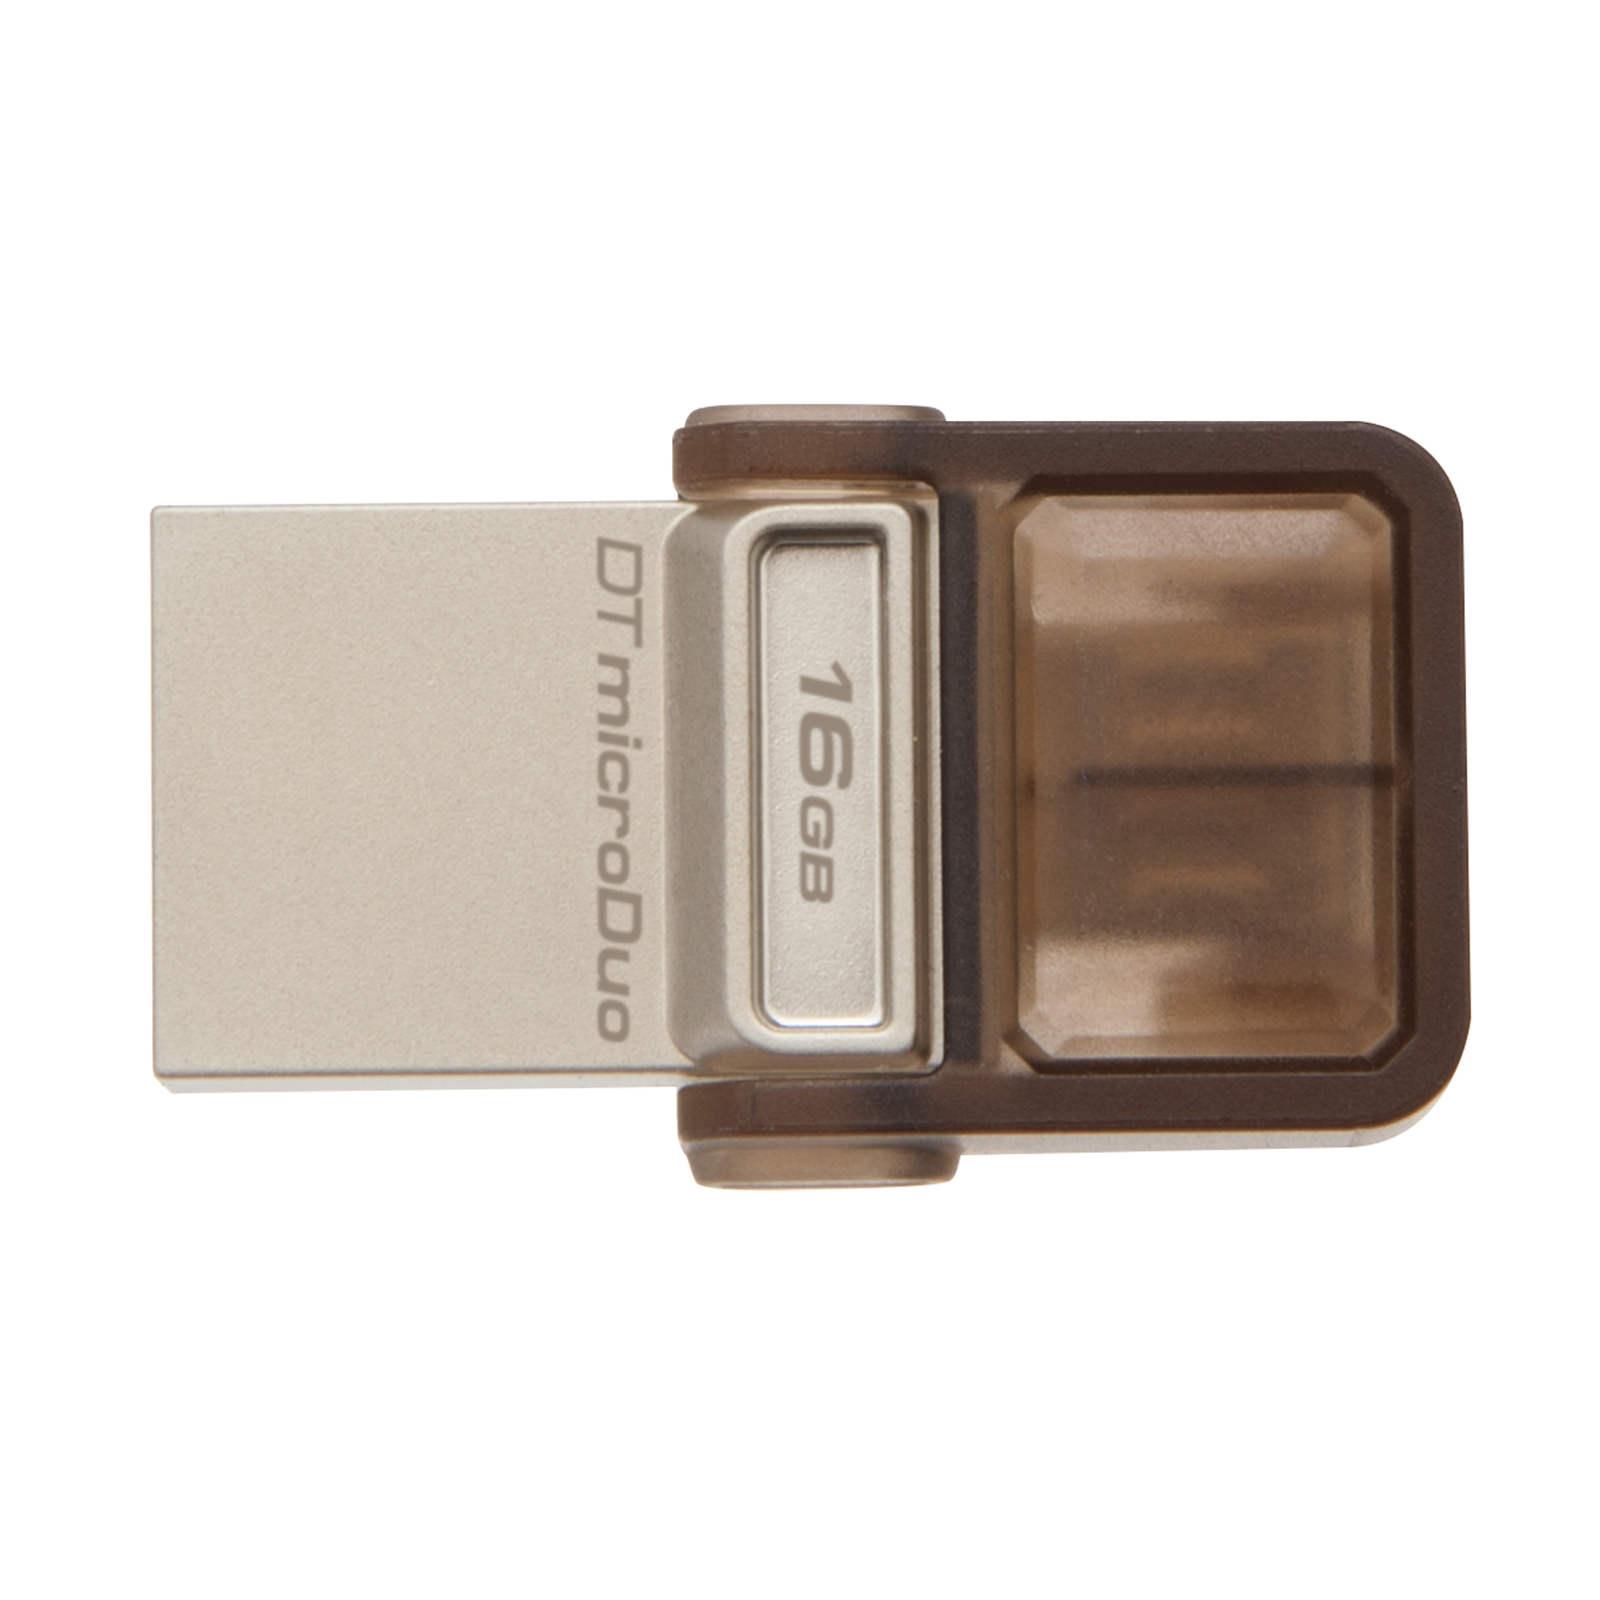 Clé USB Kingston DataTraveler microDuo 16 Go Clé USB 2.0 et MicroUSB 16 Go (garantie constructeur 5 ans)